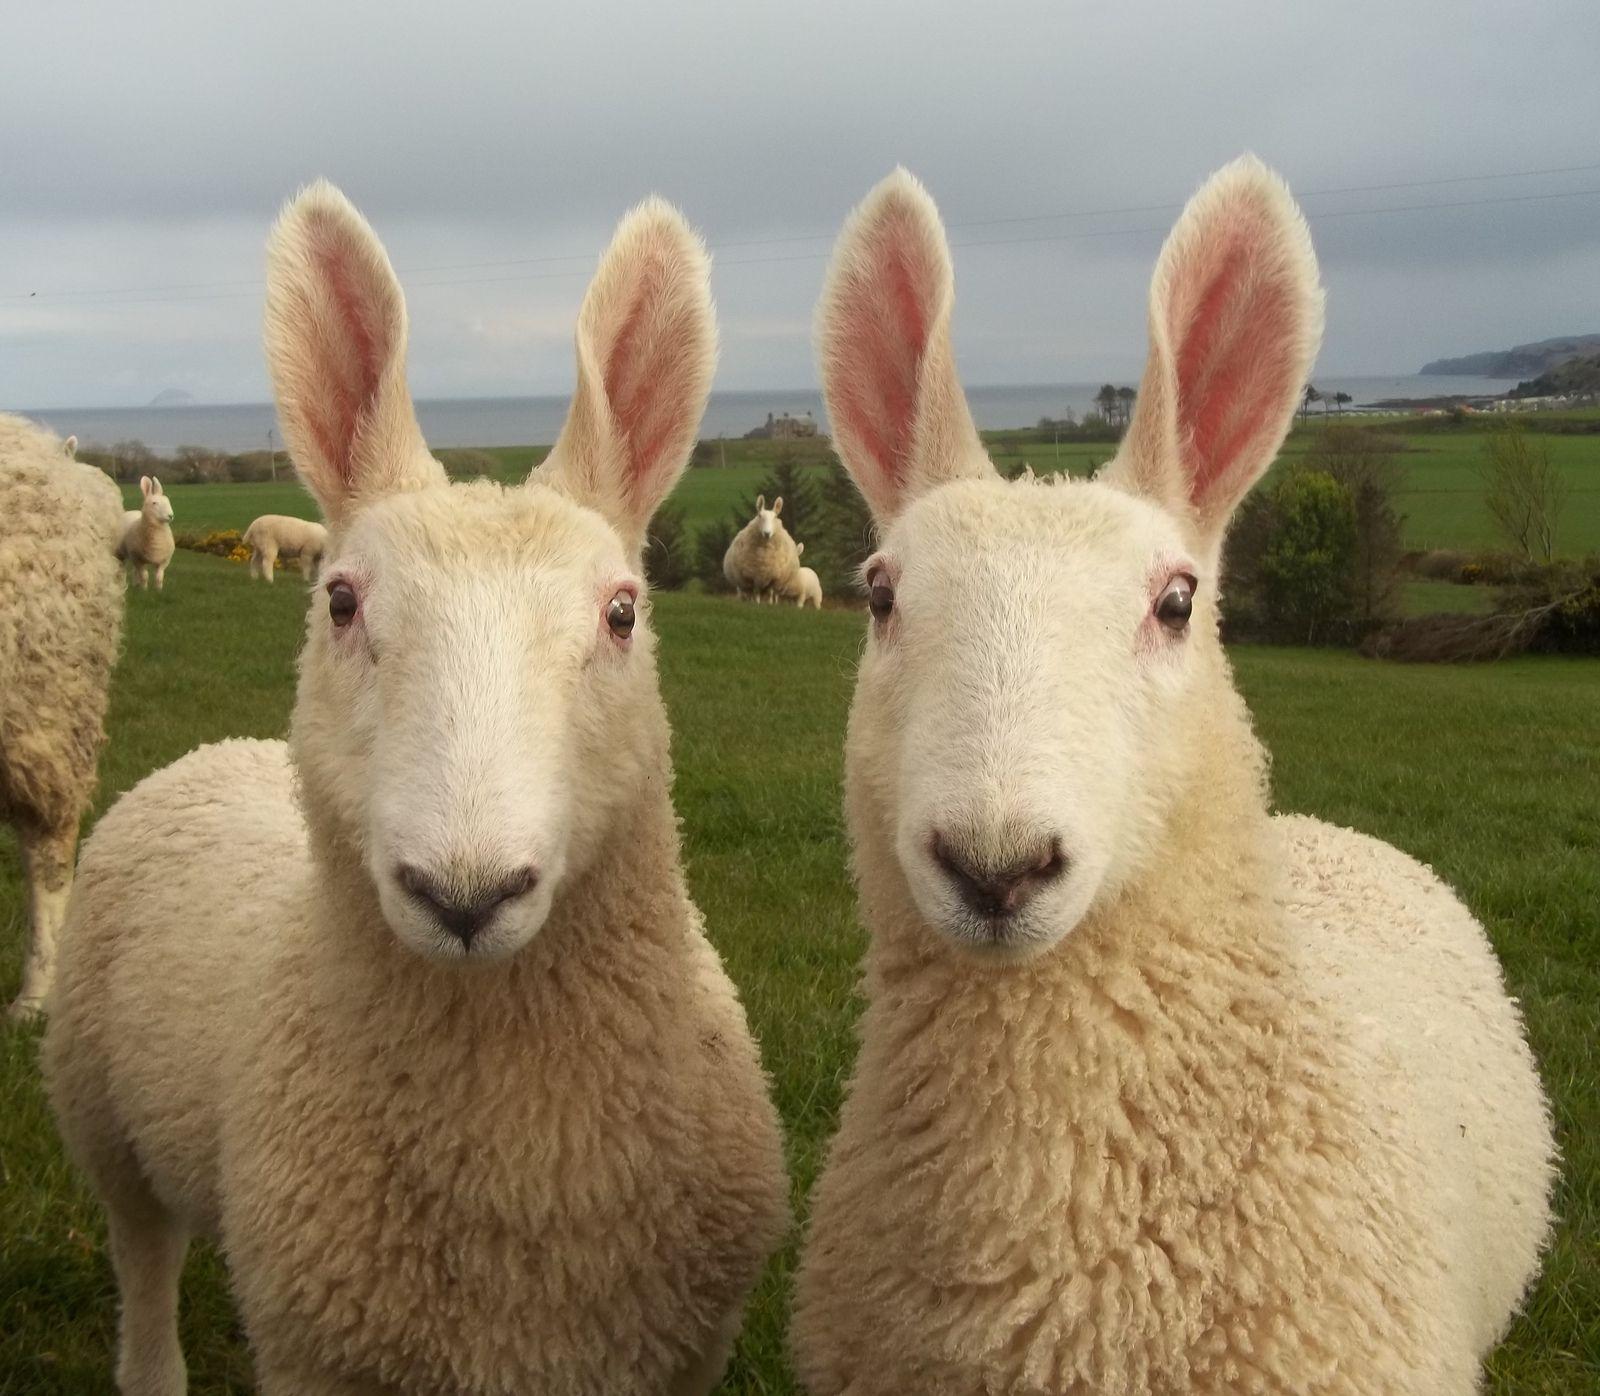 Rabbits are rams. Dwarf Rabbit Ram: breed description 73